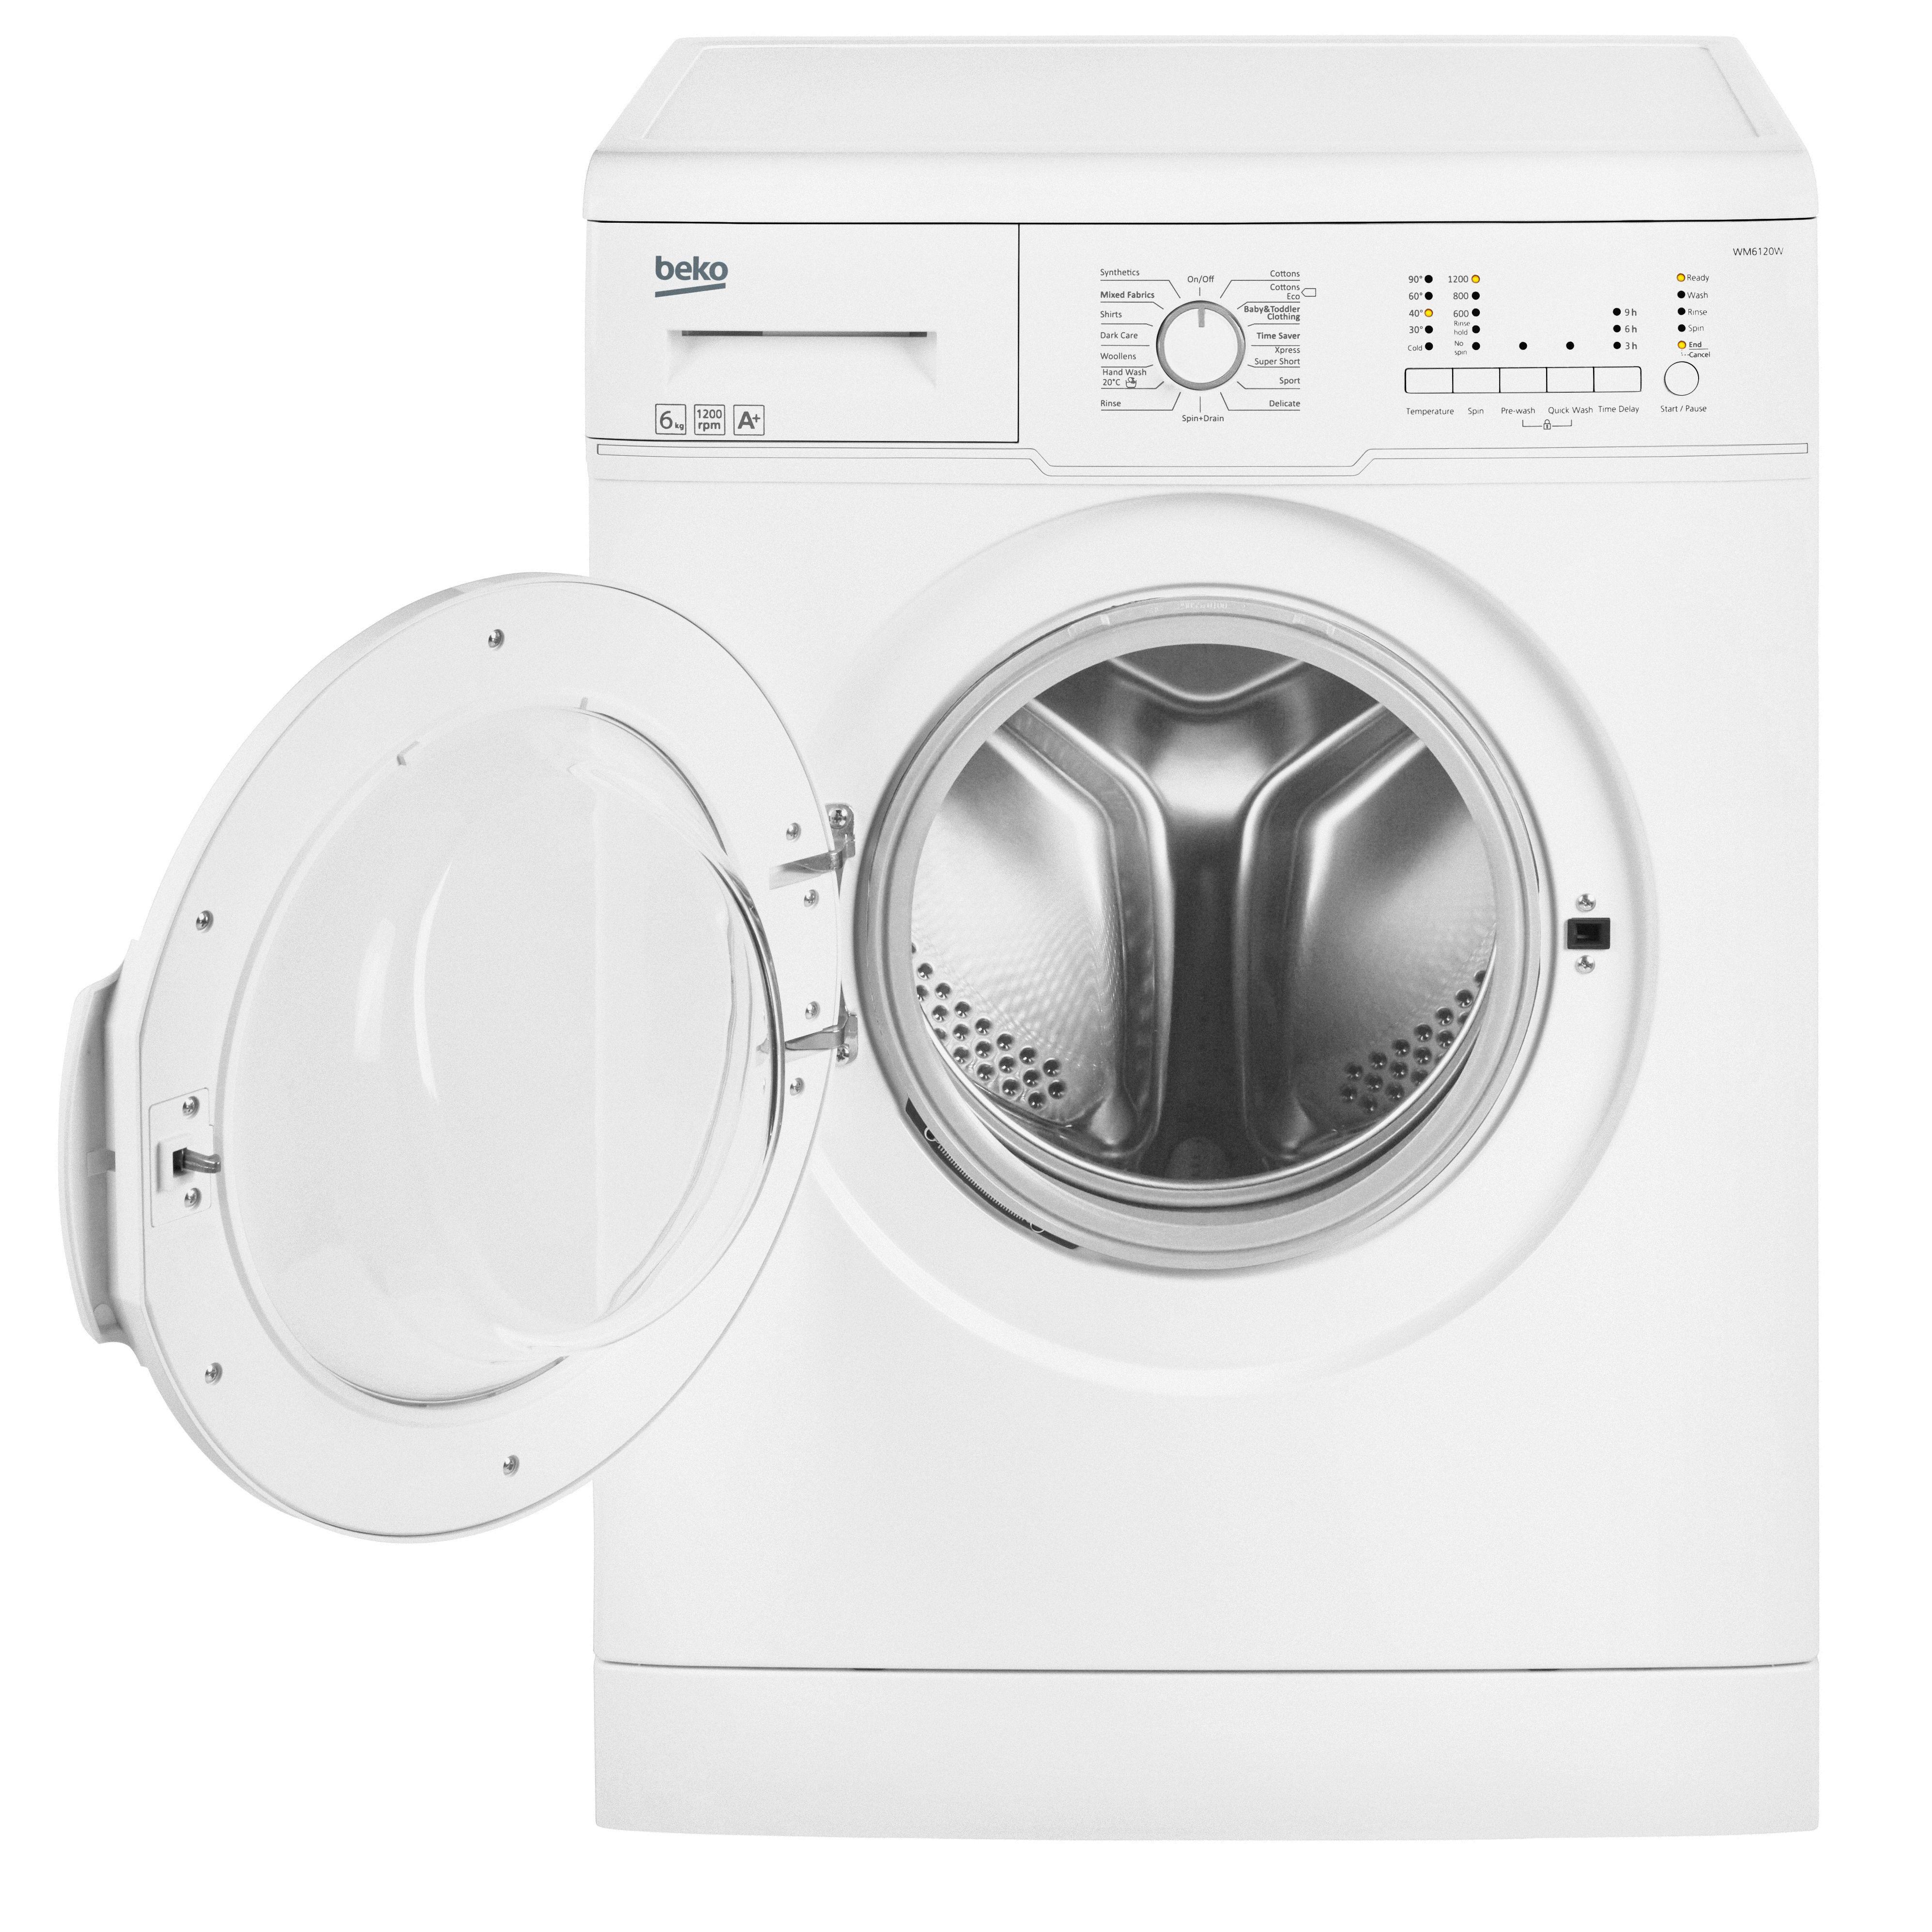 Standard Washing Machine Width Washing Machines Tumble Dryers Kitchen Appliances Kitchen